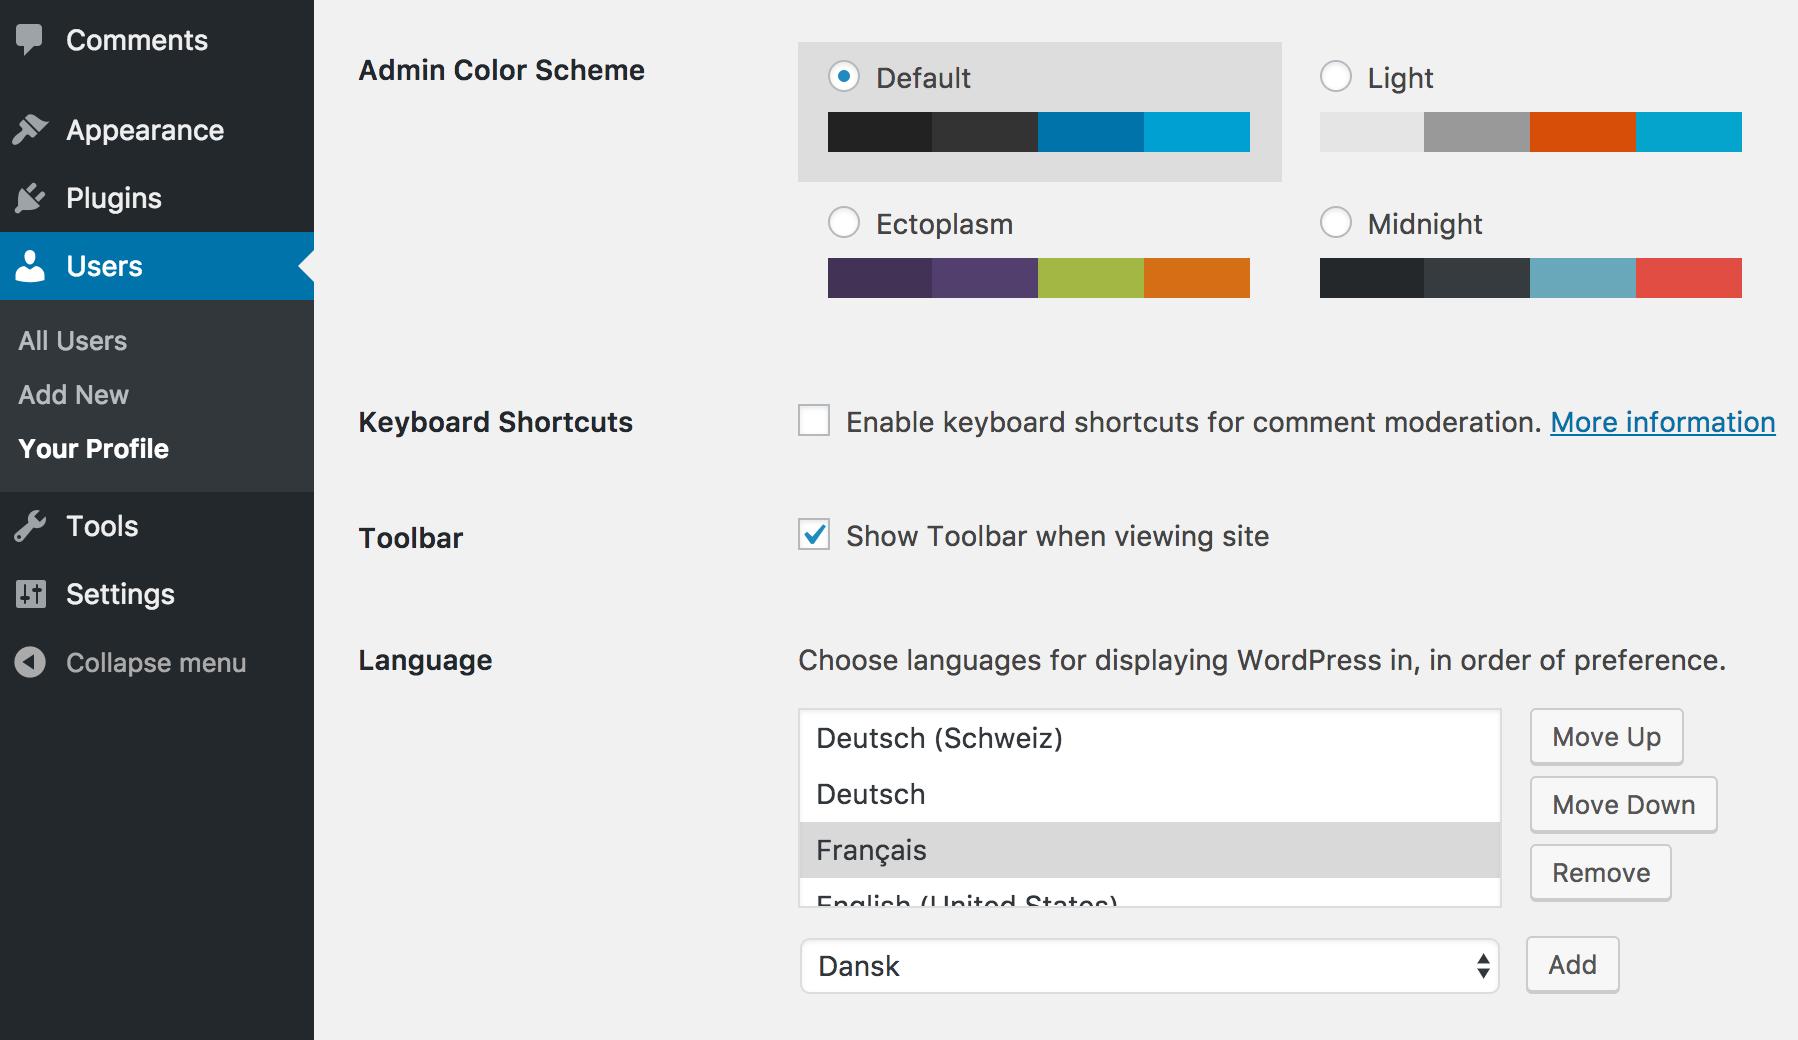 Preferred Languages: User Profile